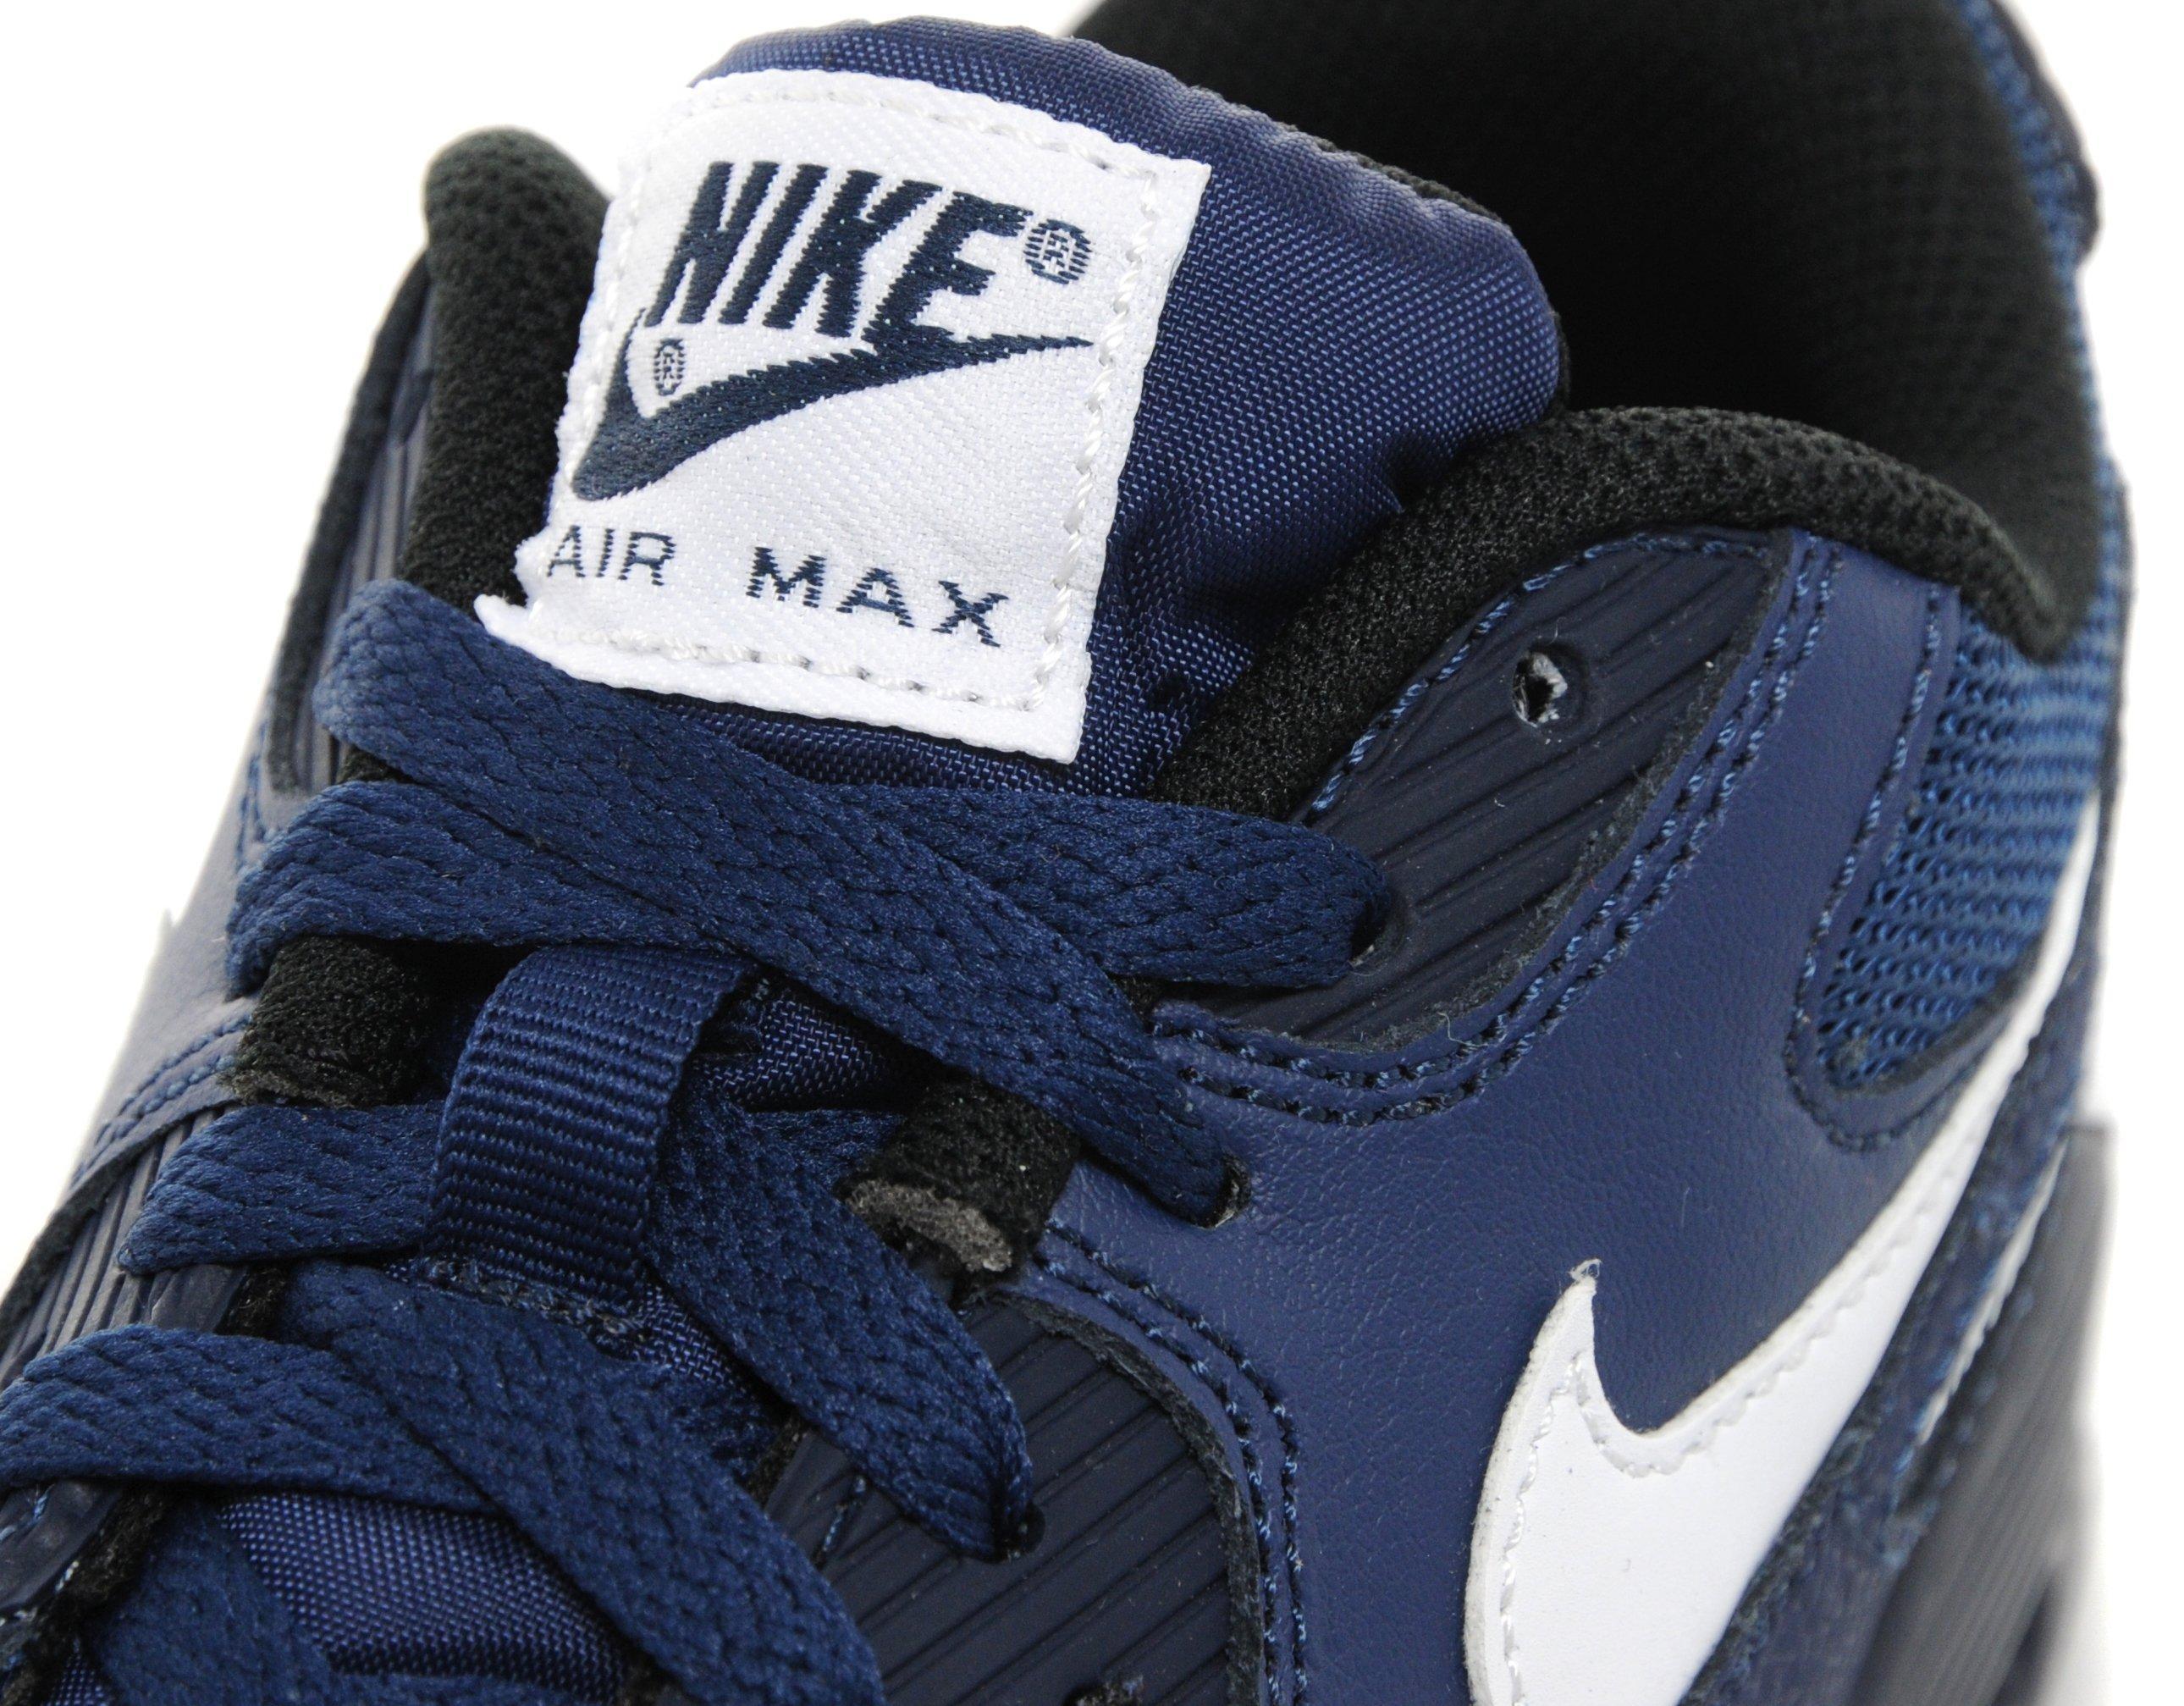 Nike Enfants Air Max Jd Sport